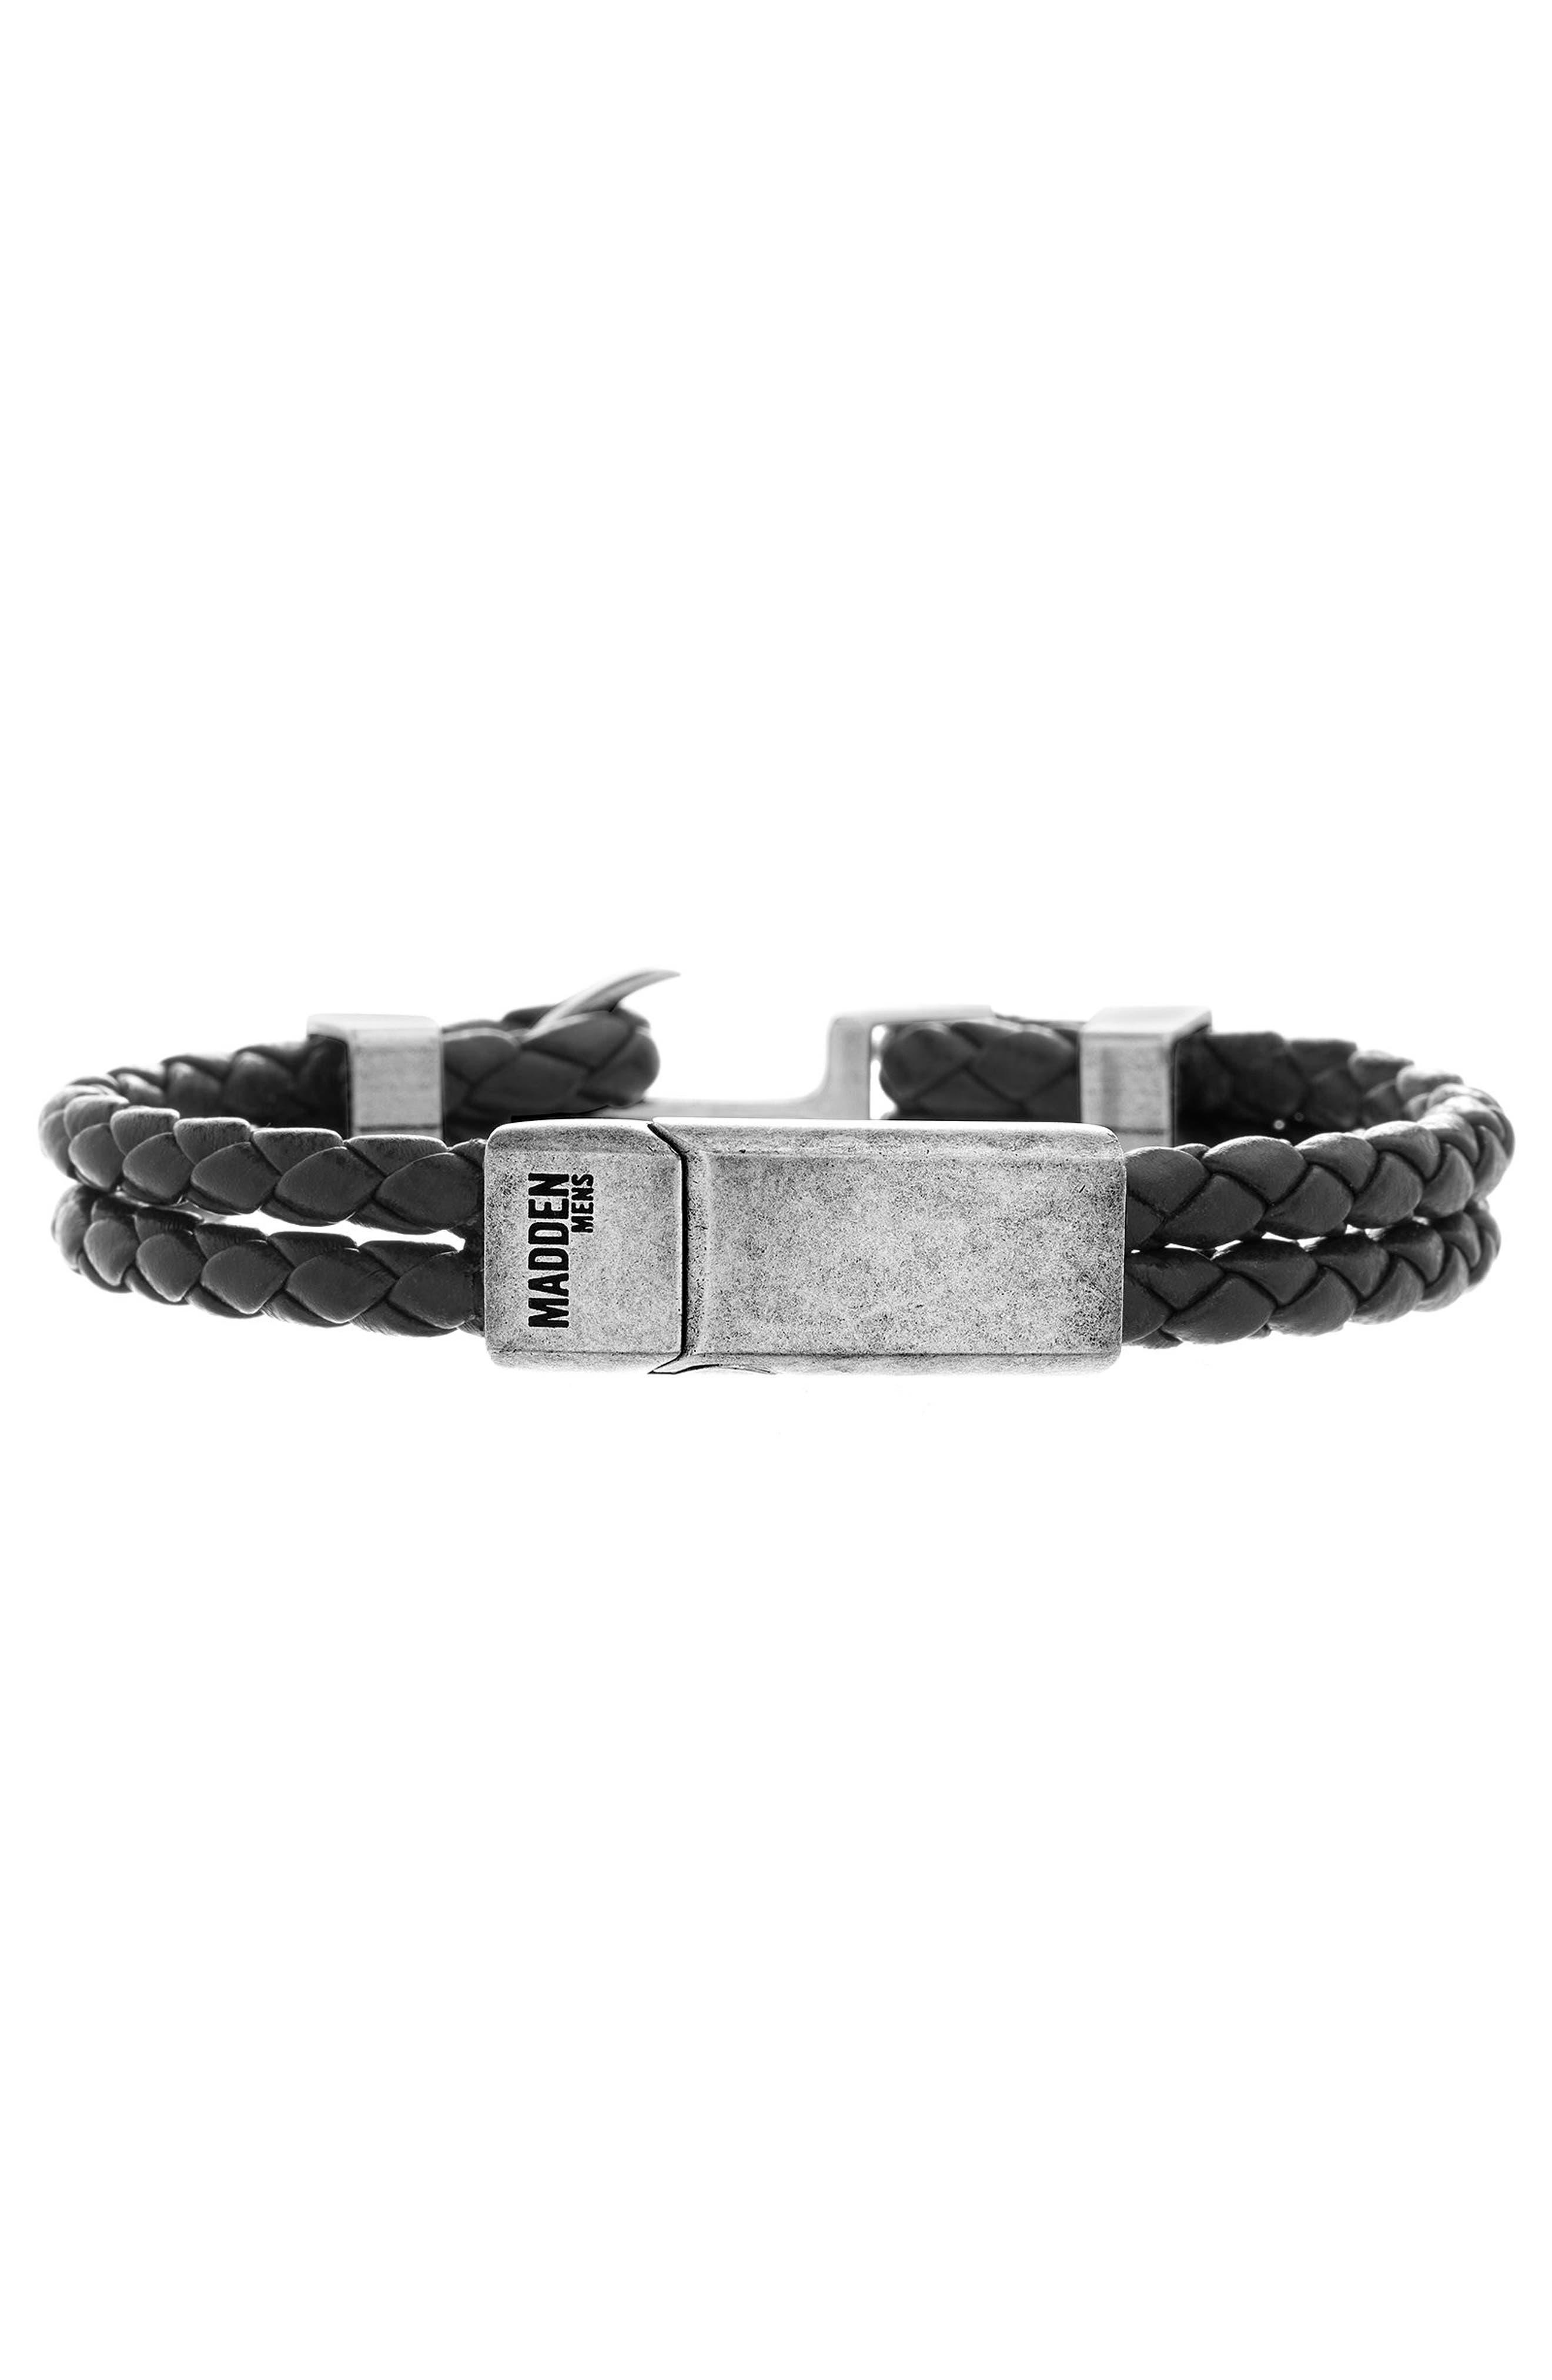 Braided Leather Bracelet,                             Main thumbnail 1, color,                             001